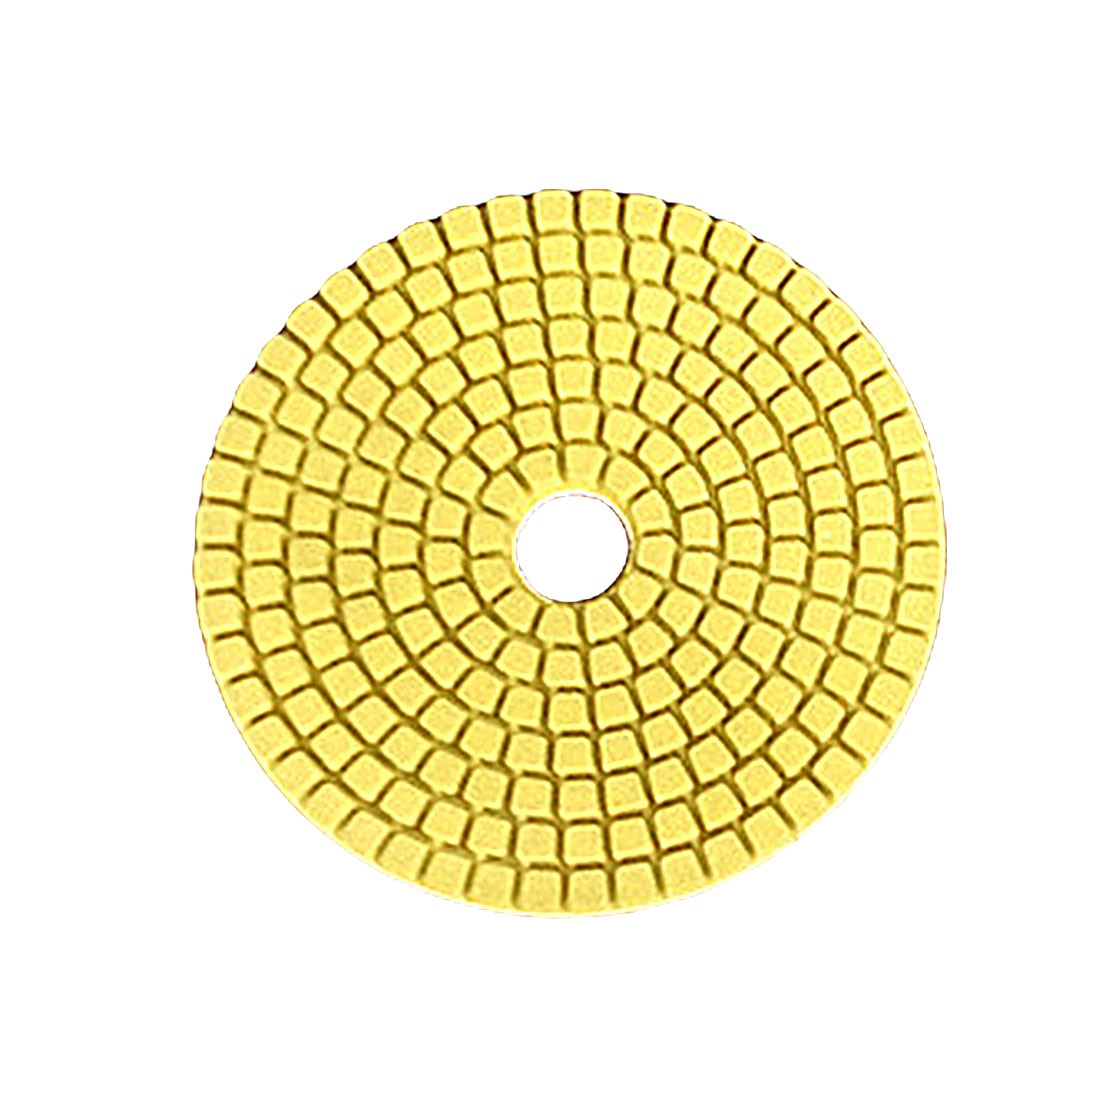 Diamond Polishing Pads Kit 4 inch 100mm Wet Dry Granite Stone Concrete Marble Polishing Grinding Discs Set Flexible Sandpaper недорого